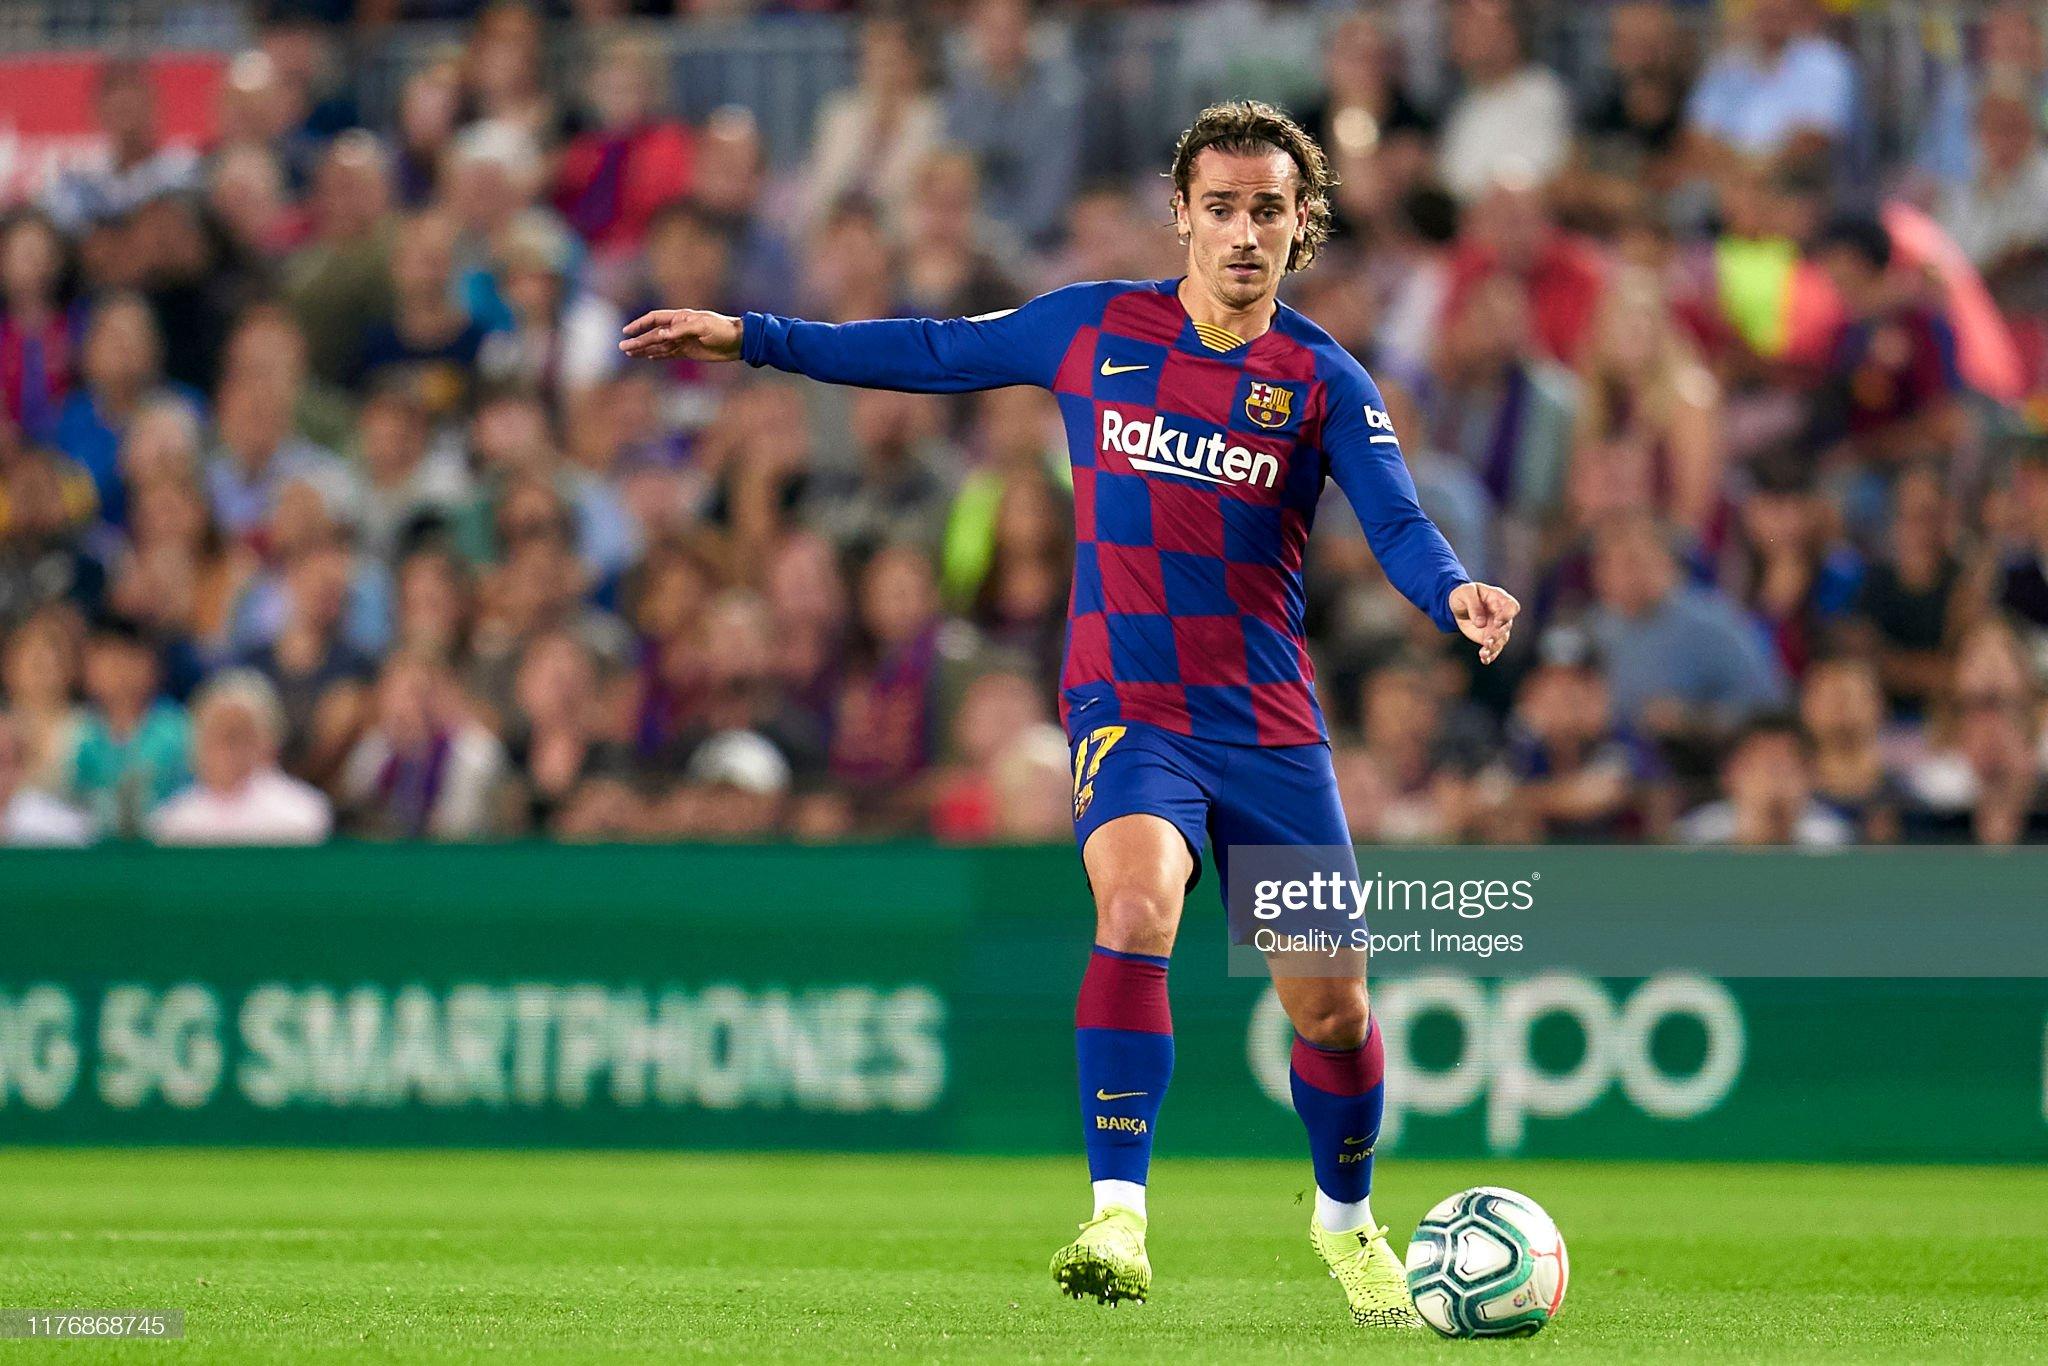 صور مباراة : برشلونة - فياريال 2-1 ( 24-09-2019 )  Antoine-griezmann-of-fc-barcelona-with-the-ball-during-the-liga-match-picture-id1176868745?s=2048x2048